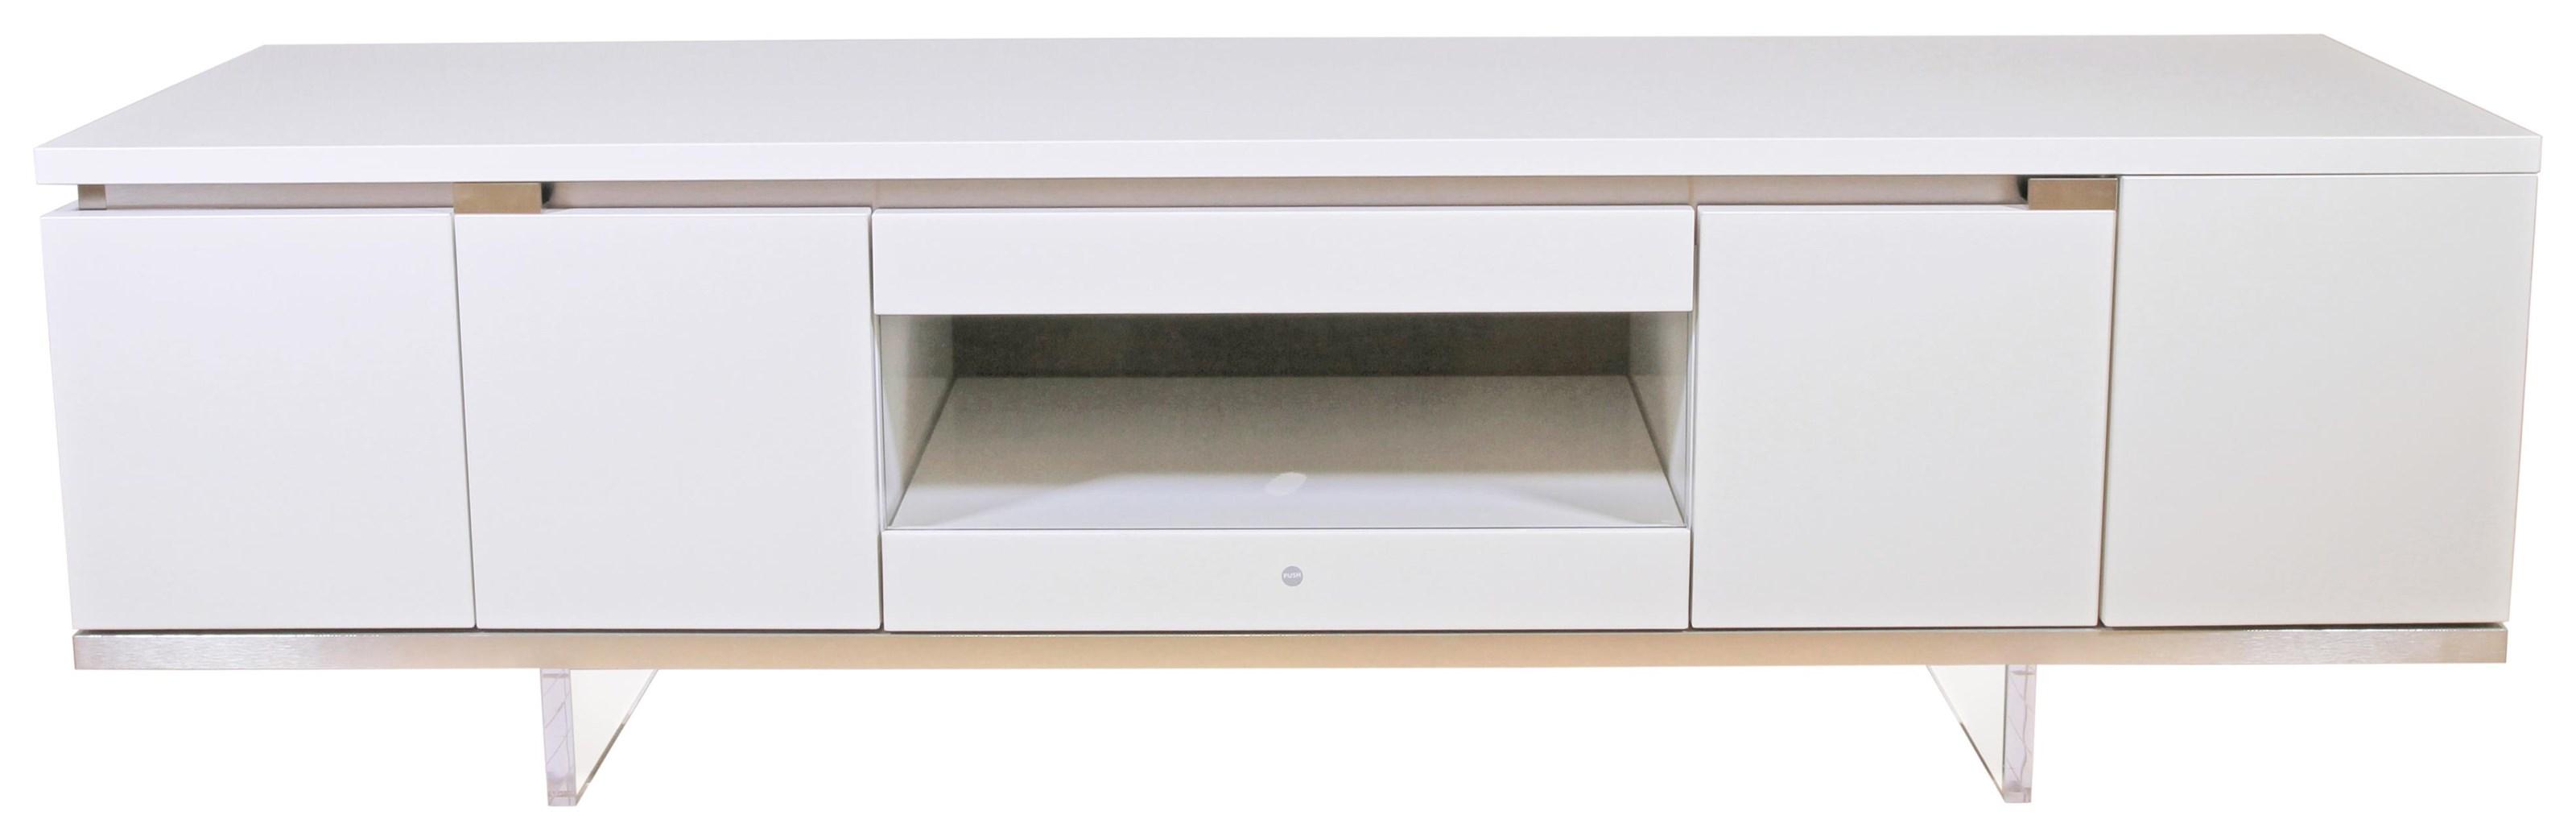 Artemide TV Console by Alf Italia at HomeWorld Furniture